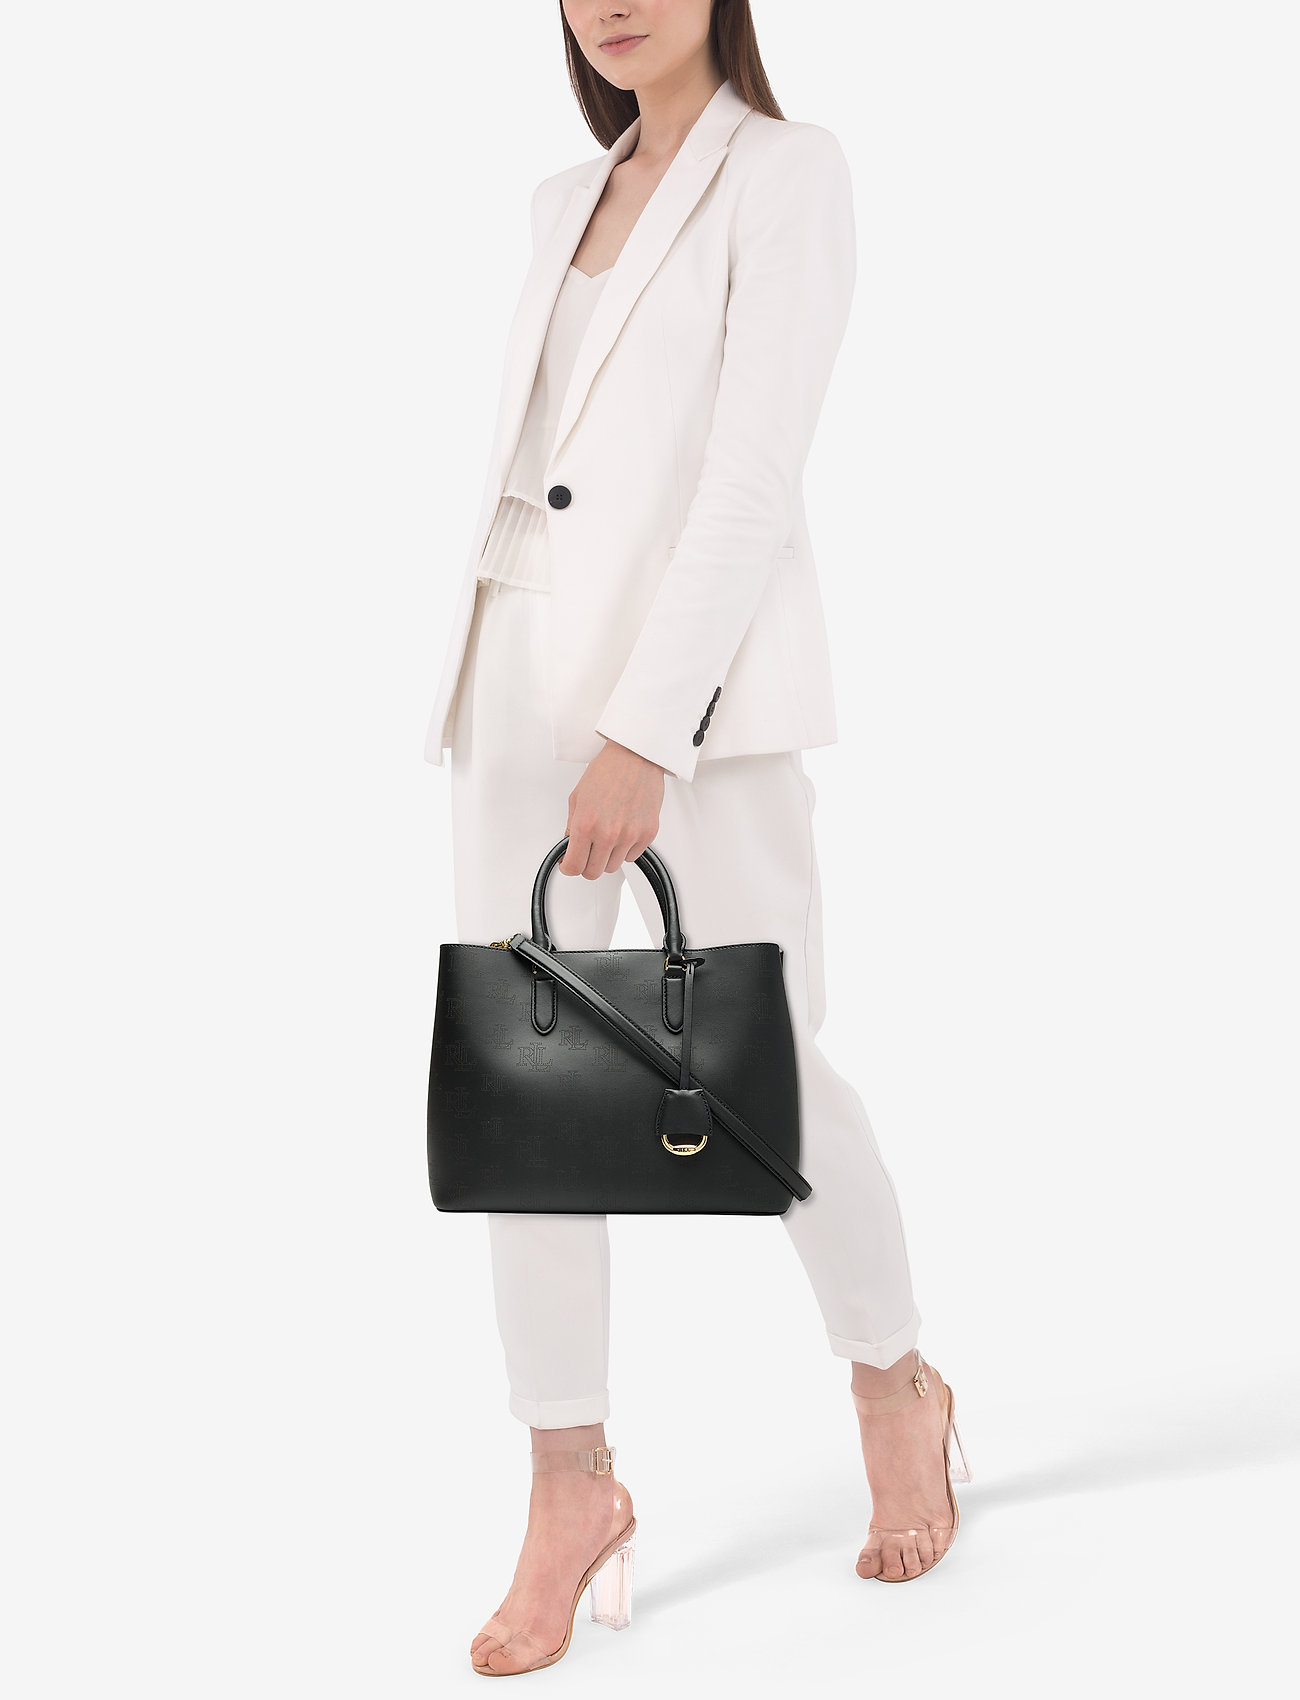 Lauren Ralph Lauren Large Leather Marcy Satchel - BLACK/PORCINI